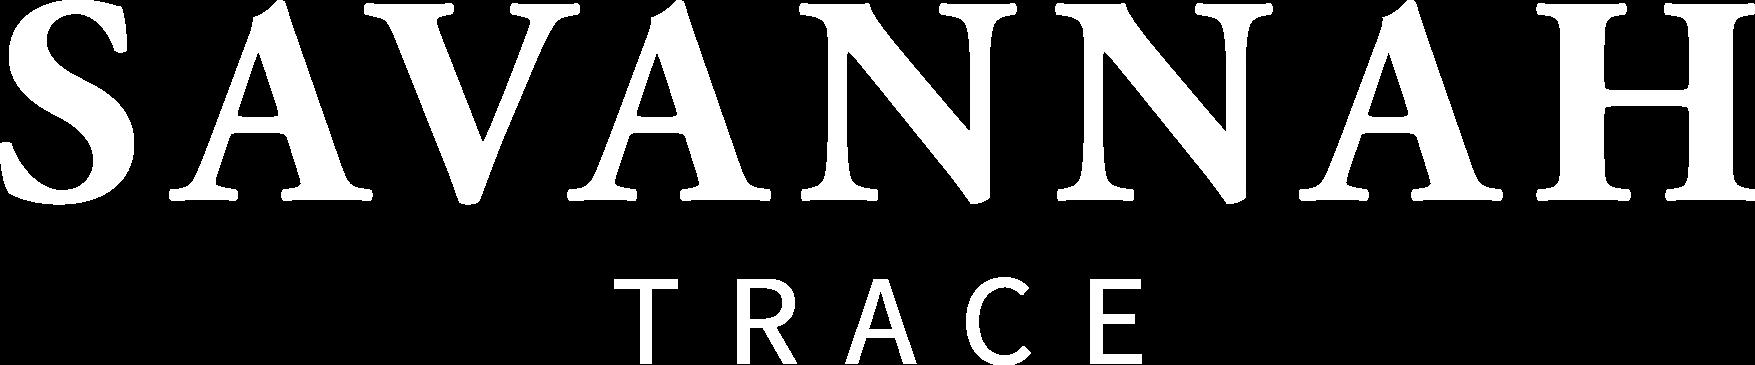 Savannah Trace   Apartments in Kalamazoo, MI